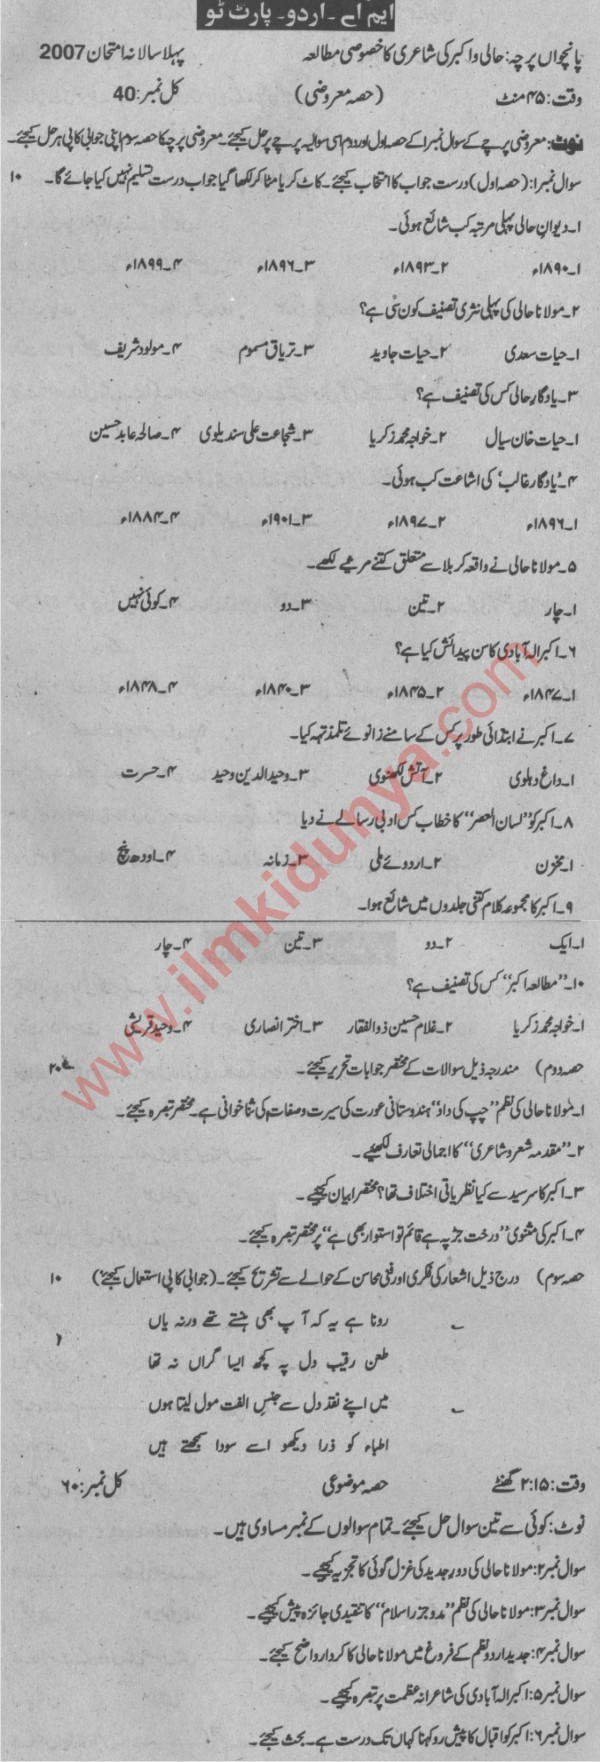 Sargodha University Past Papers 2007 MA Urdu Part 2 Hali